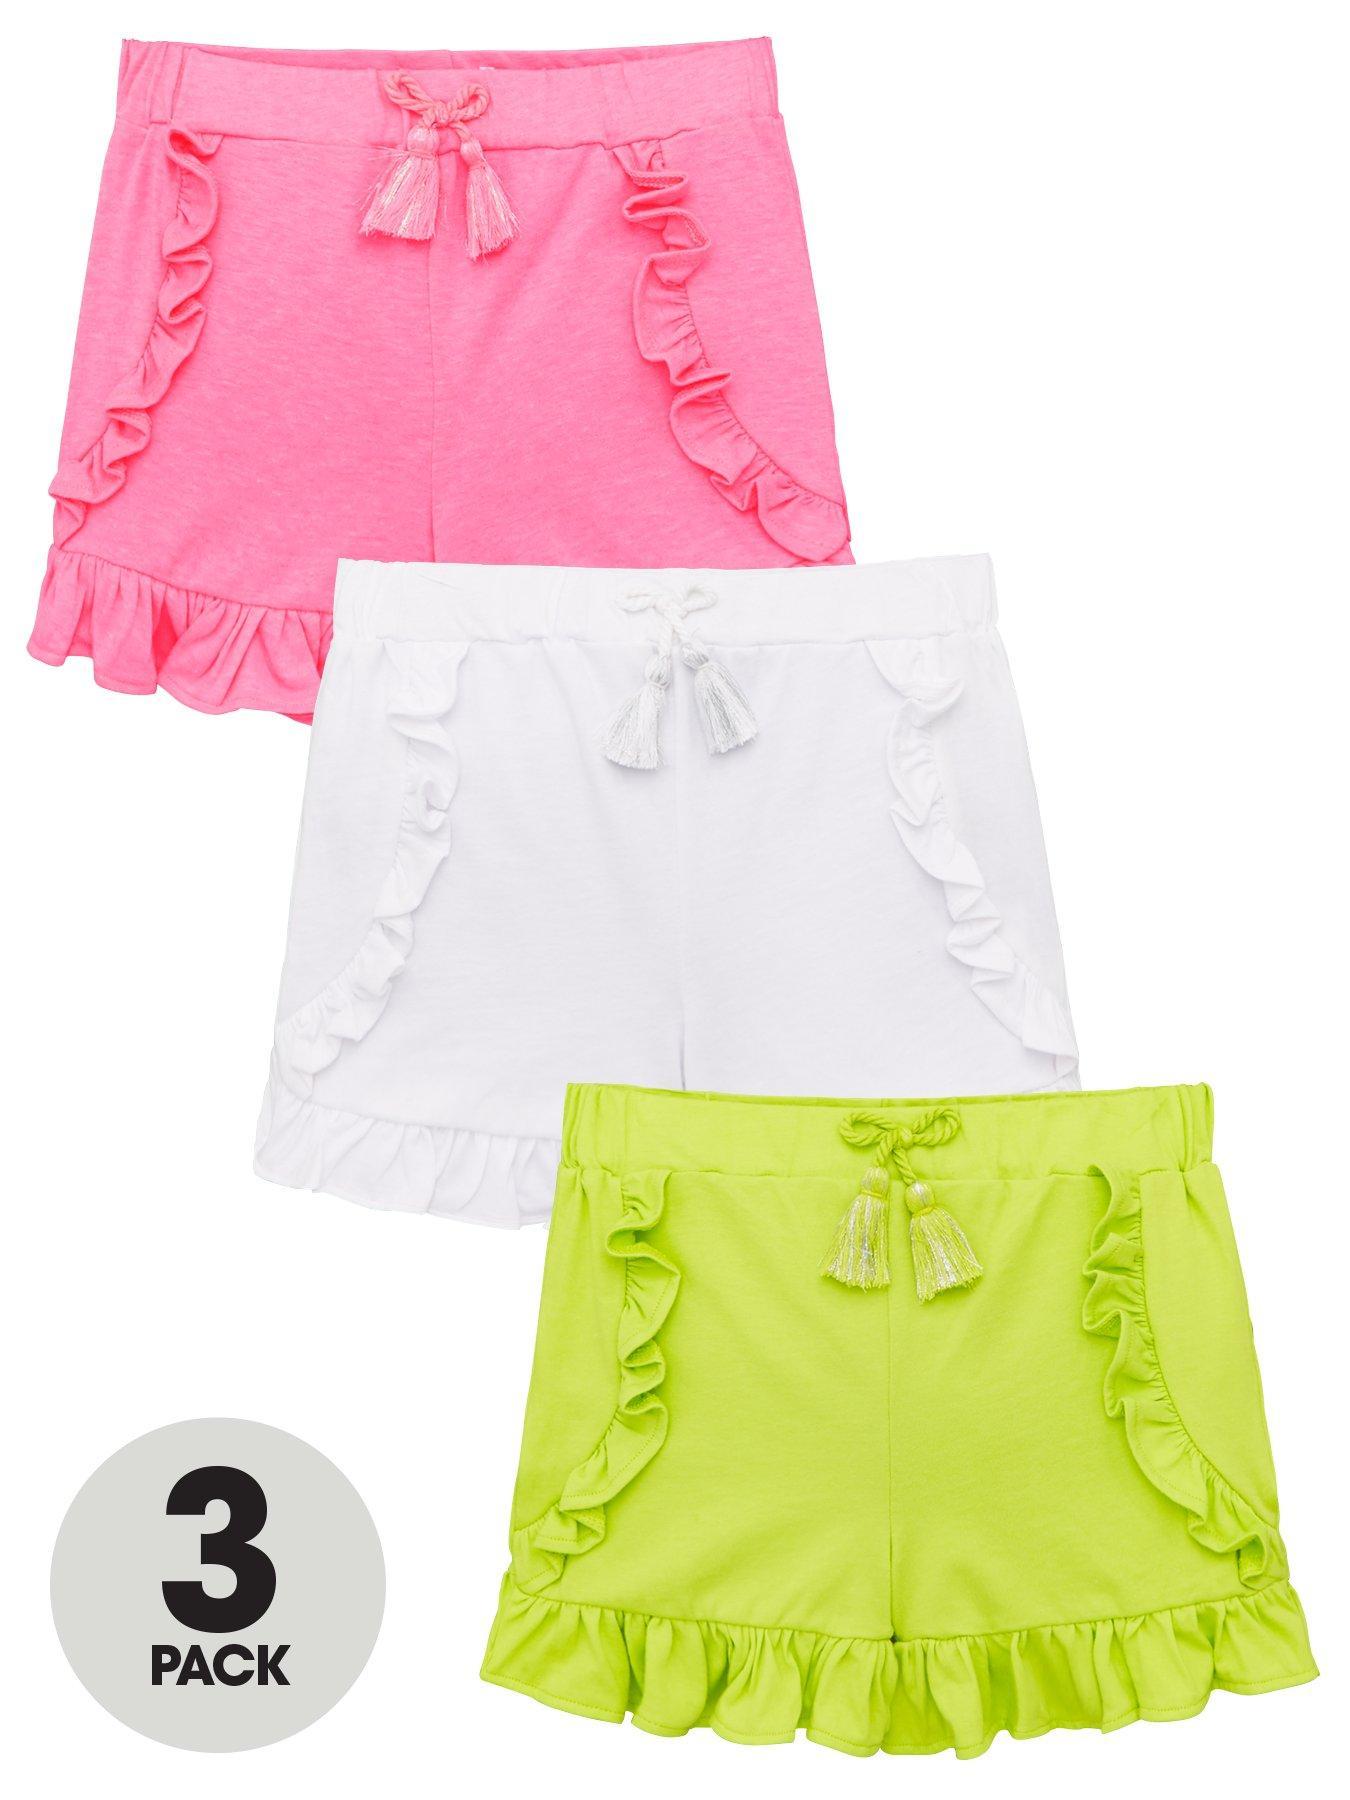 River Island Girls Teens Pink Multi Frill Hem Shorts Ages 5,6,7 11,12 New